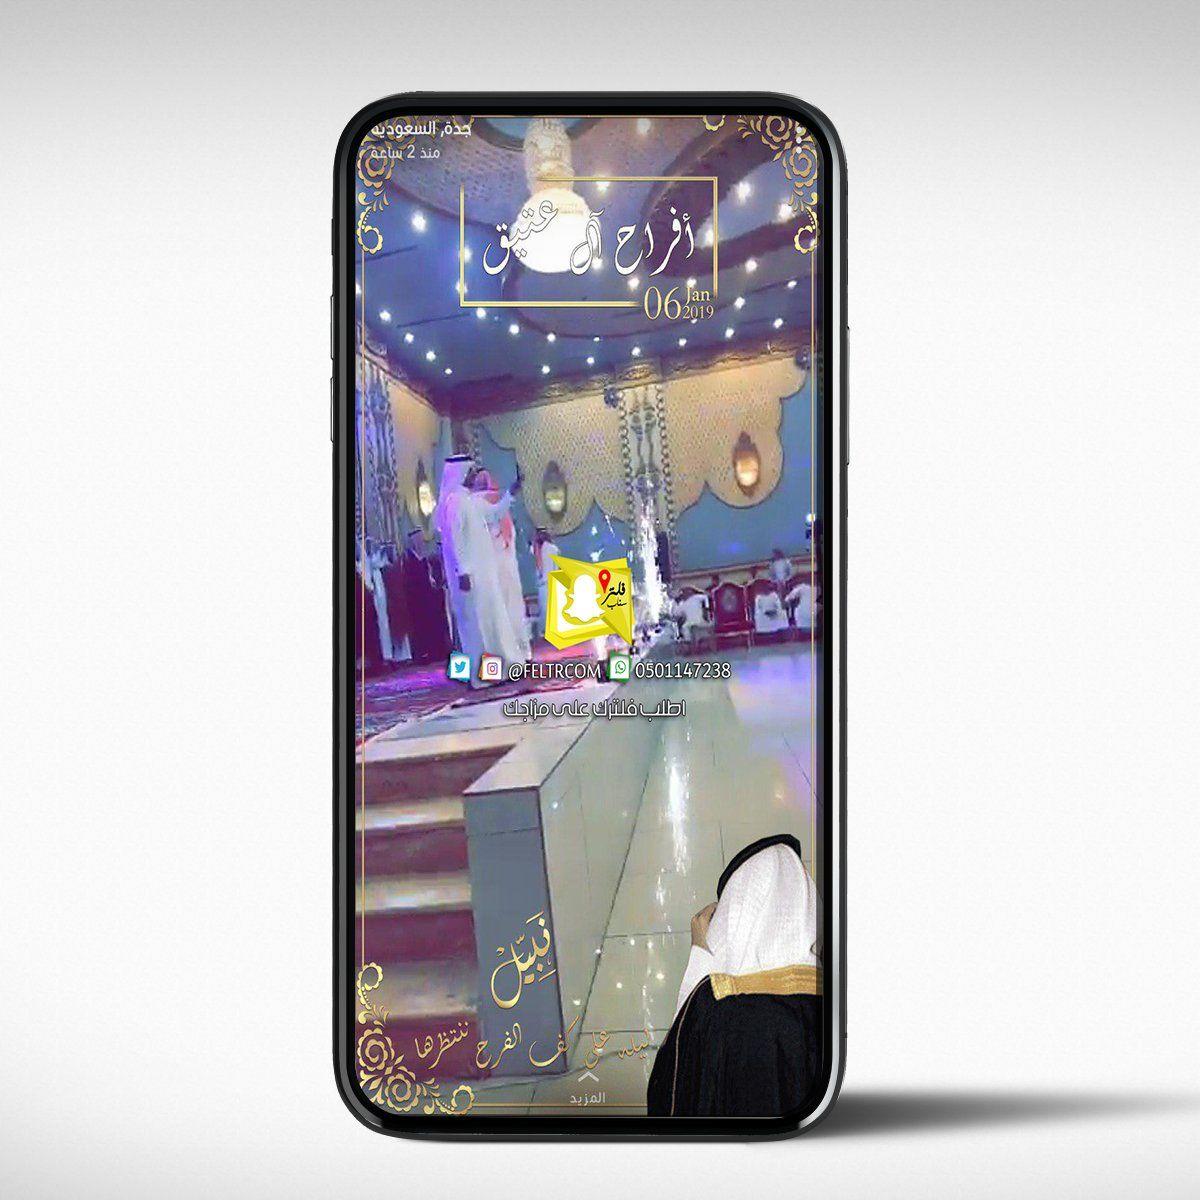 فلتر سناب Filter Snap Feltrcom تويتر Phone Cases Lunch Box Electronic Products